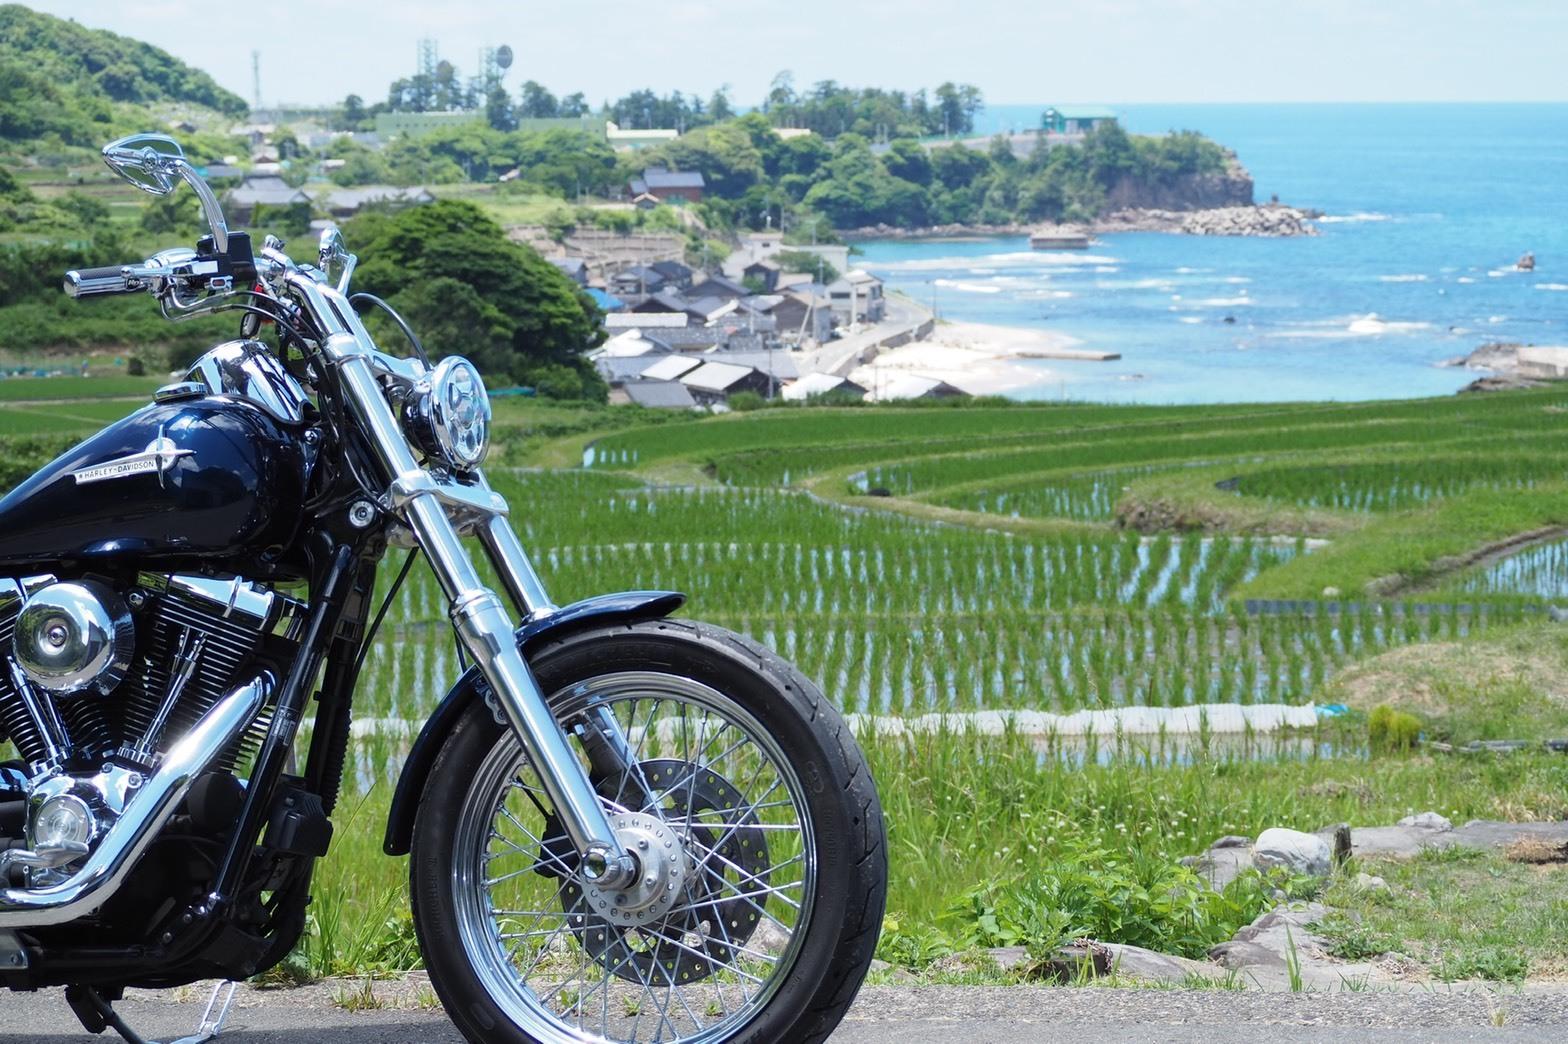 harleydavidson-motorcycle-touring-blog-kyoto-tanngopeninsula-riceterraces-of-sodeshi-view-2.jpg